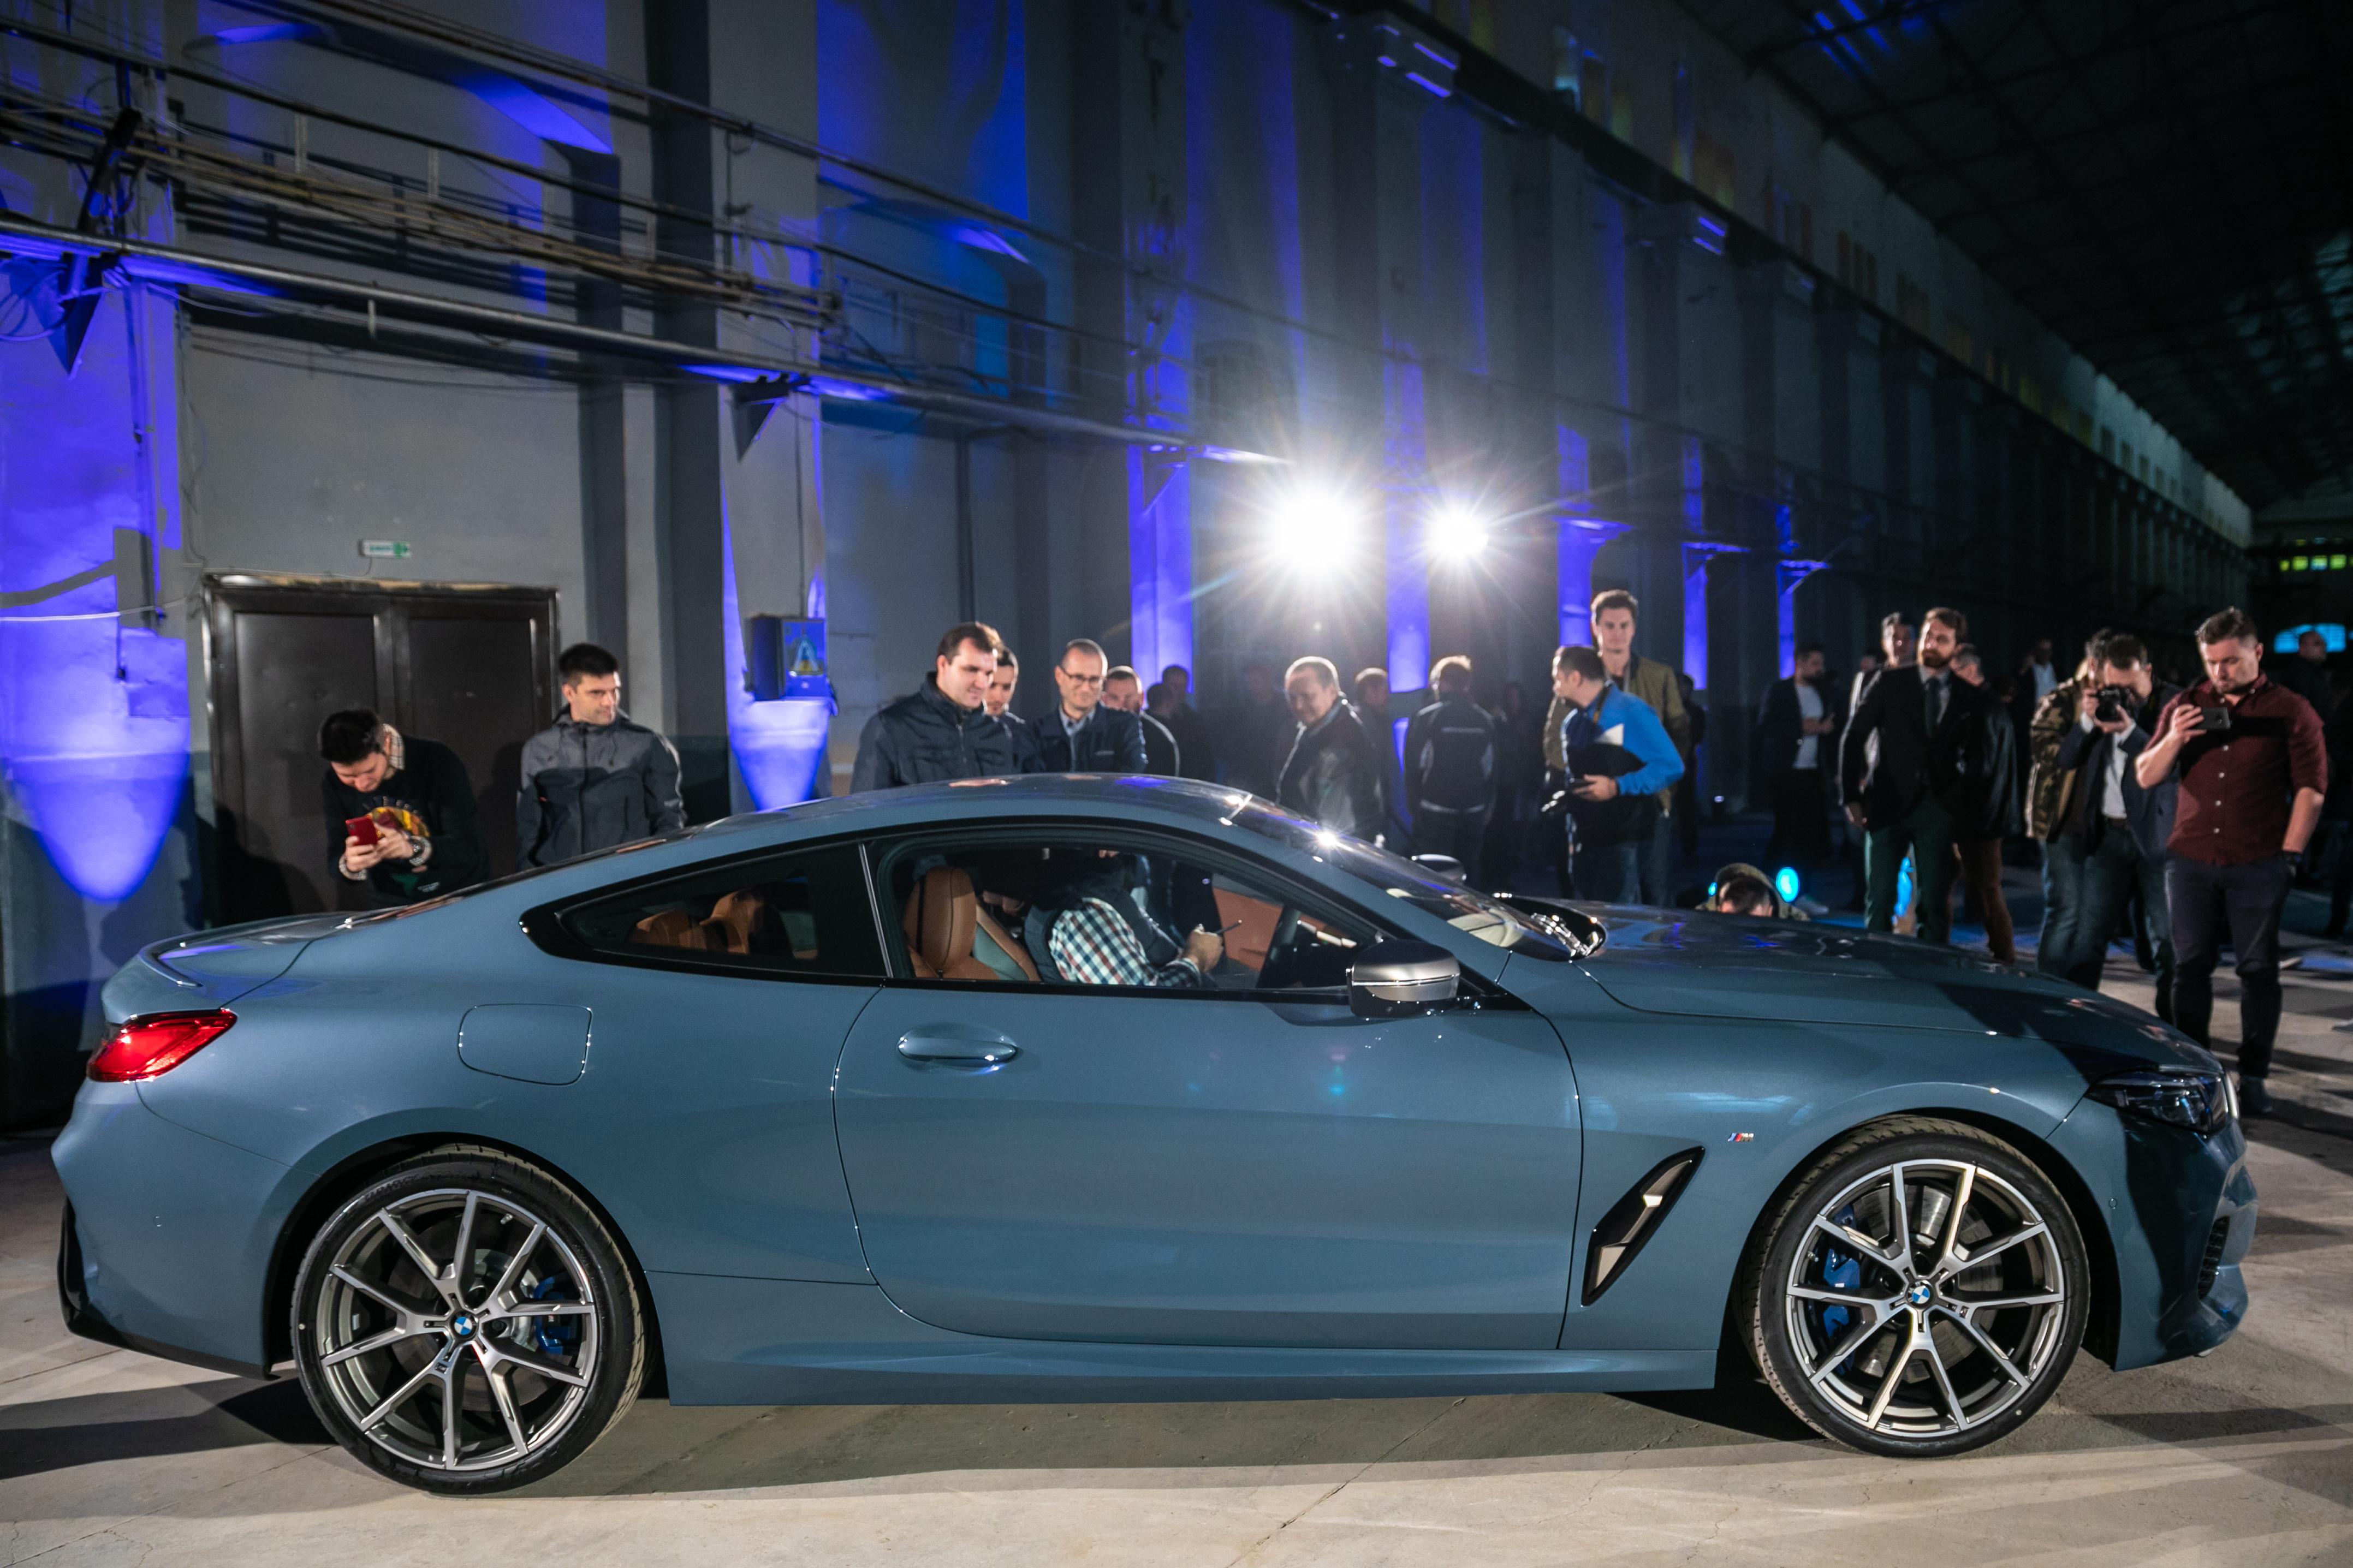 P90329648_highRes_bmw-8-series-media-l Noul BMW Seria 8 arata spectaculos